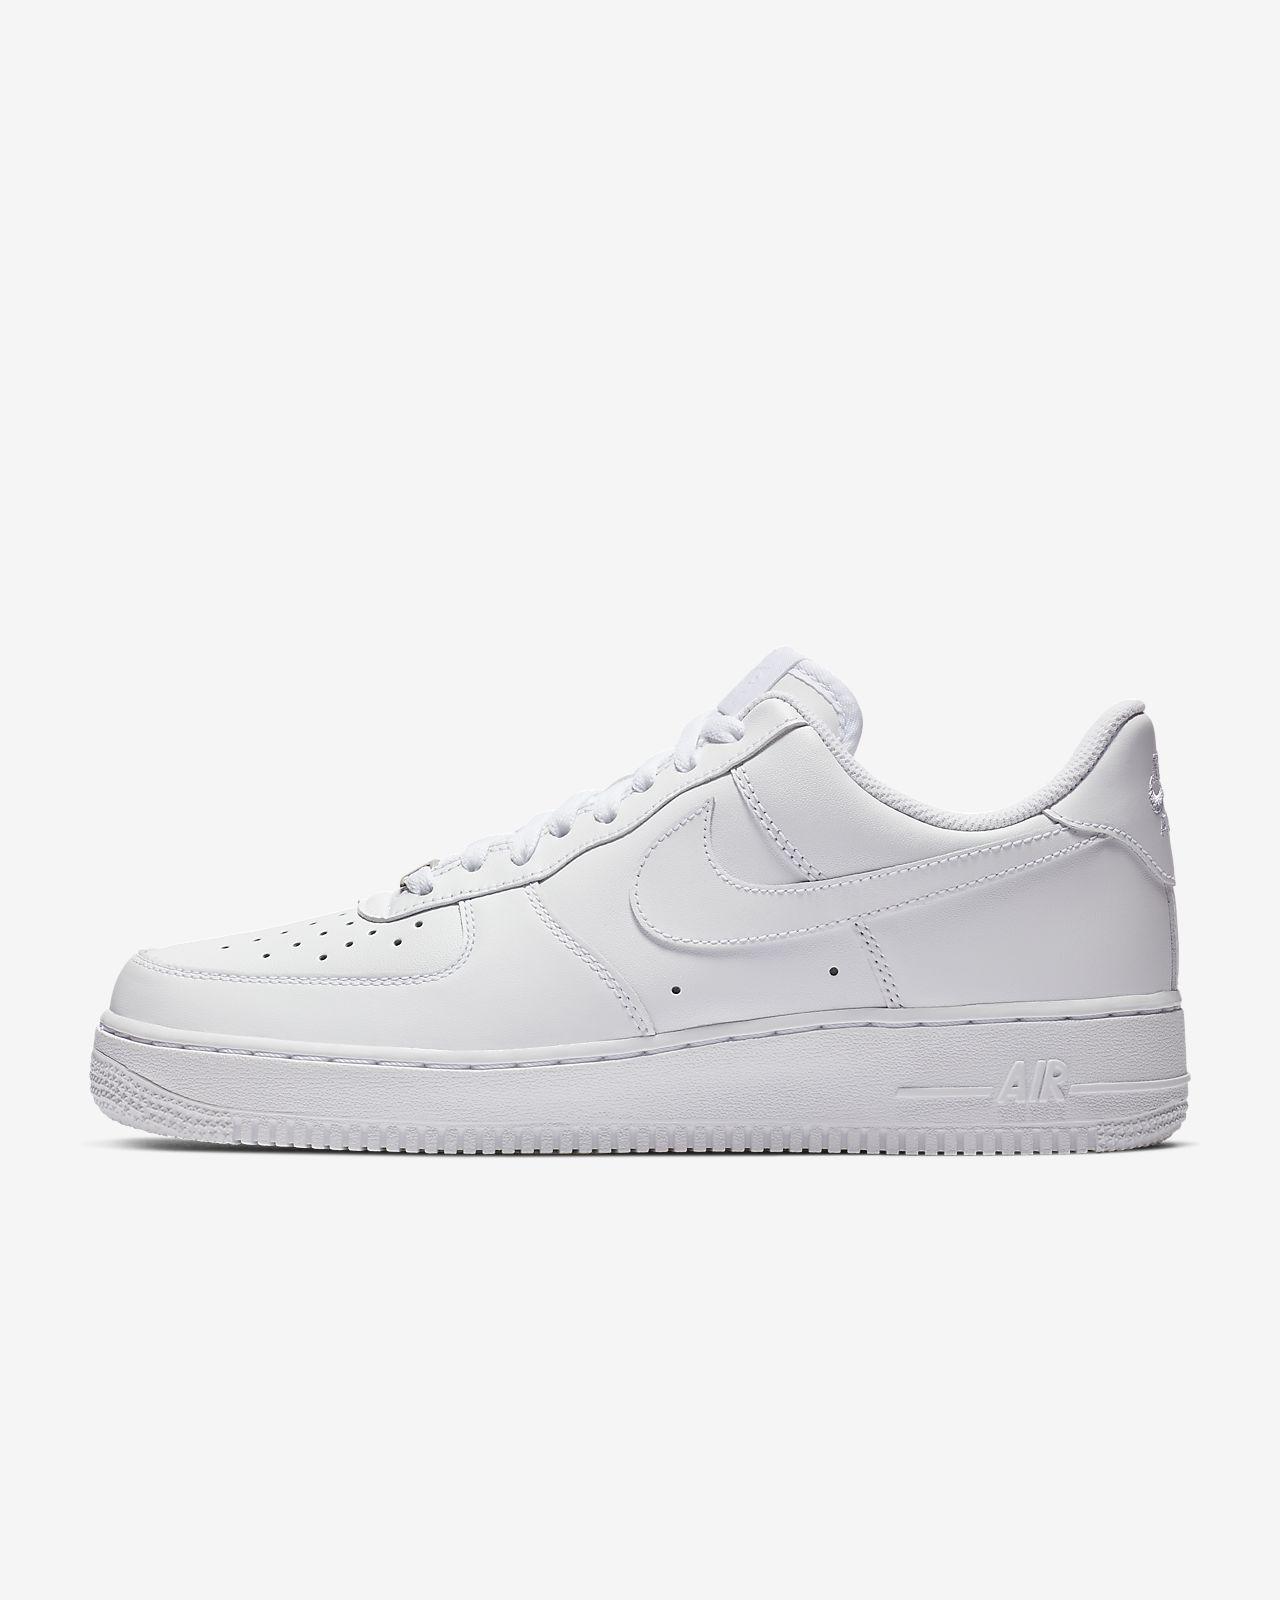 Nike Air Force 1 '07 女子运动鞋